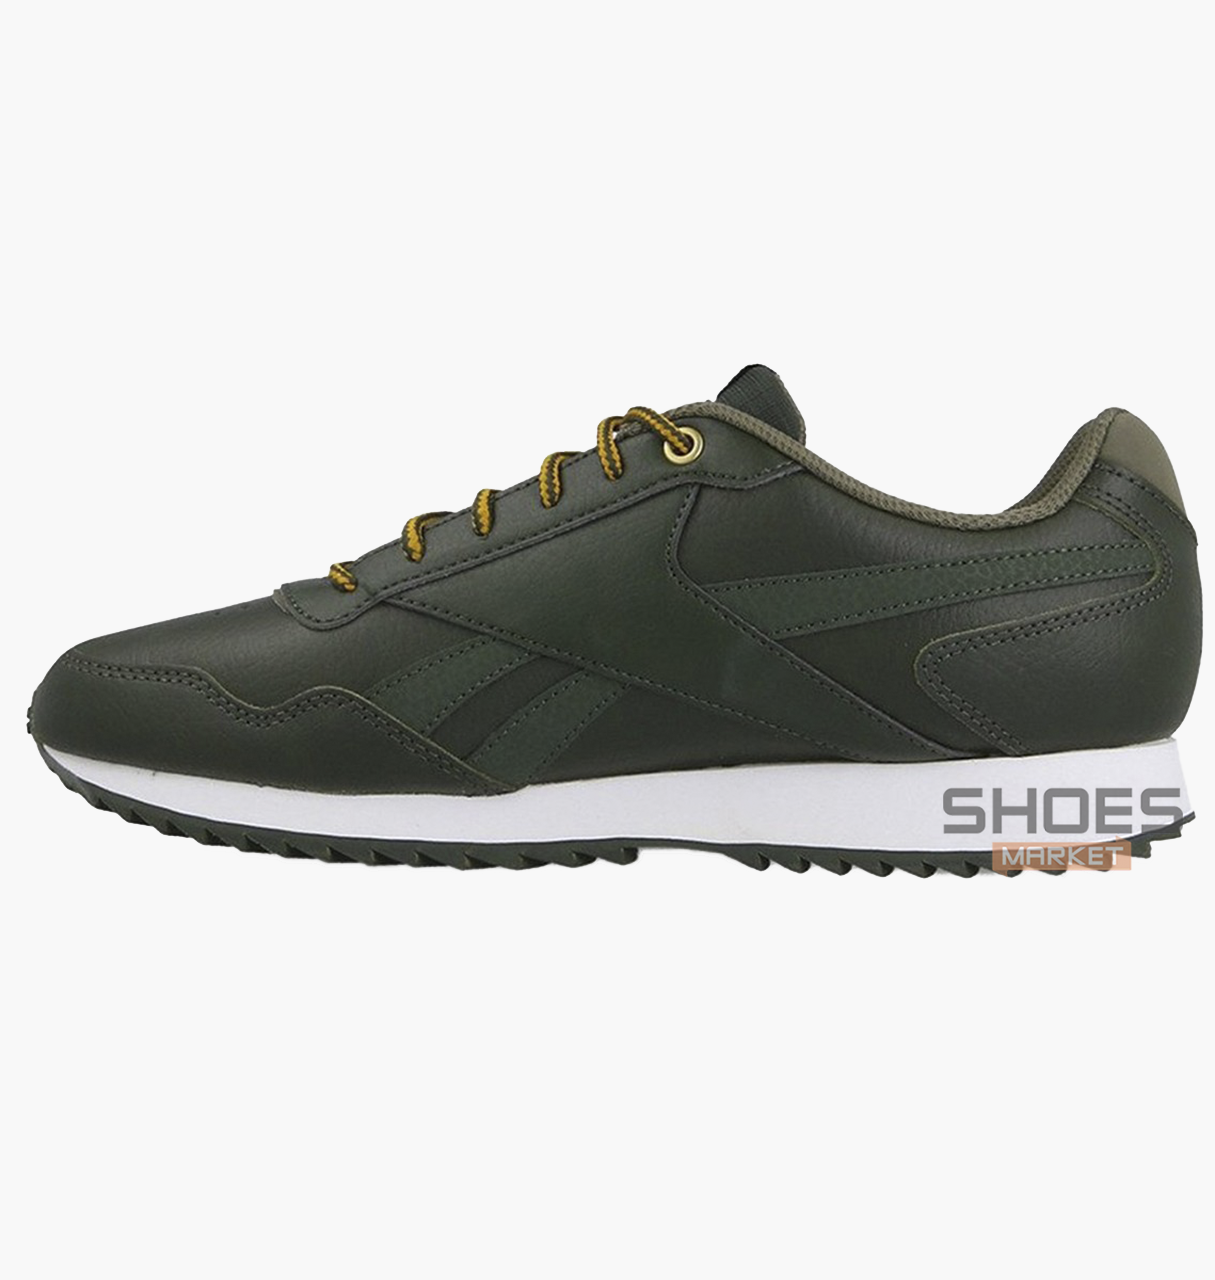 Мужские кроссовки Reebok Royal Glide Green CN4529, оригинал